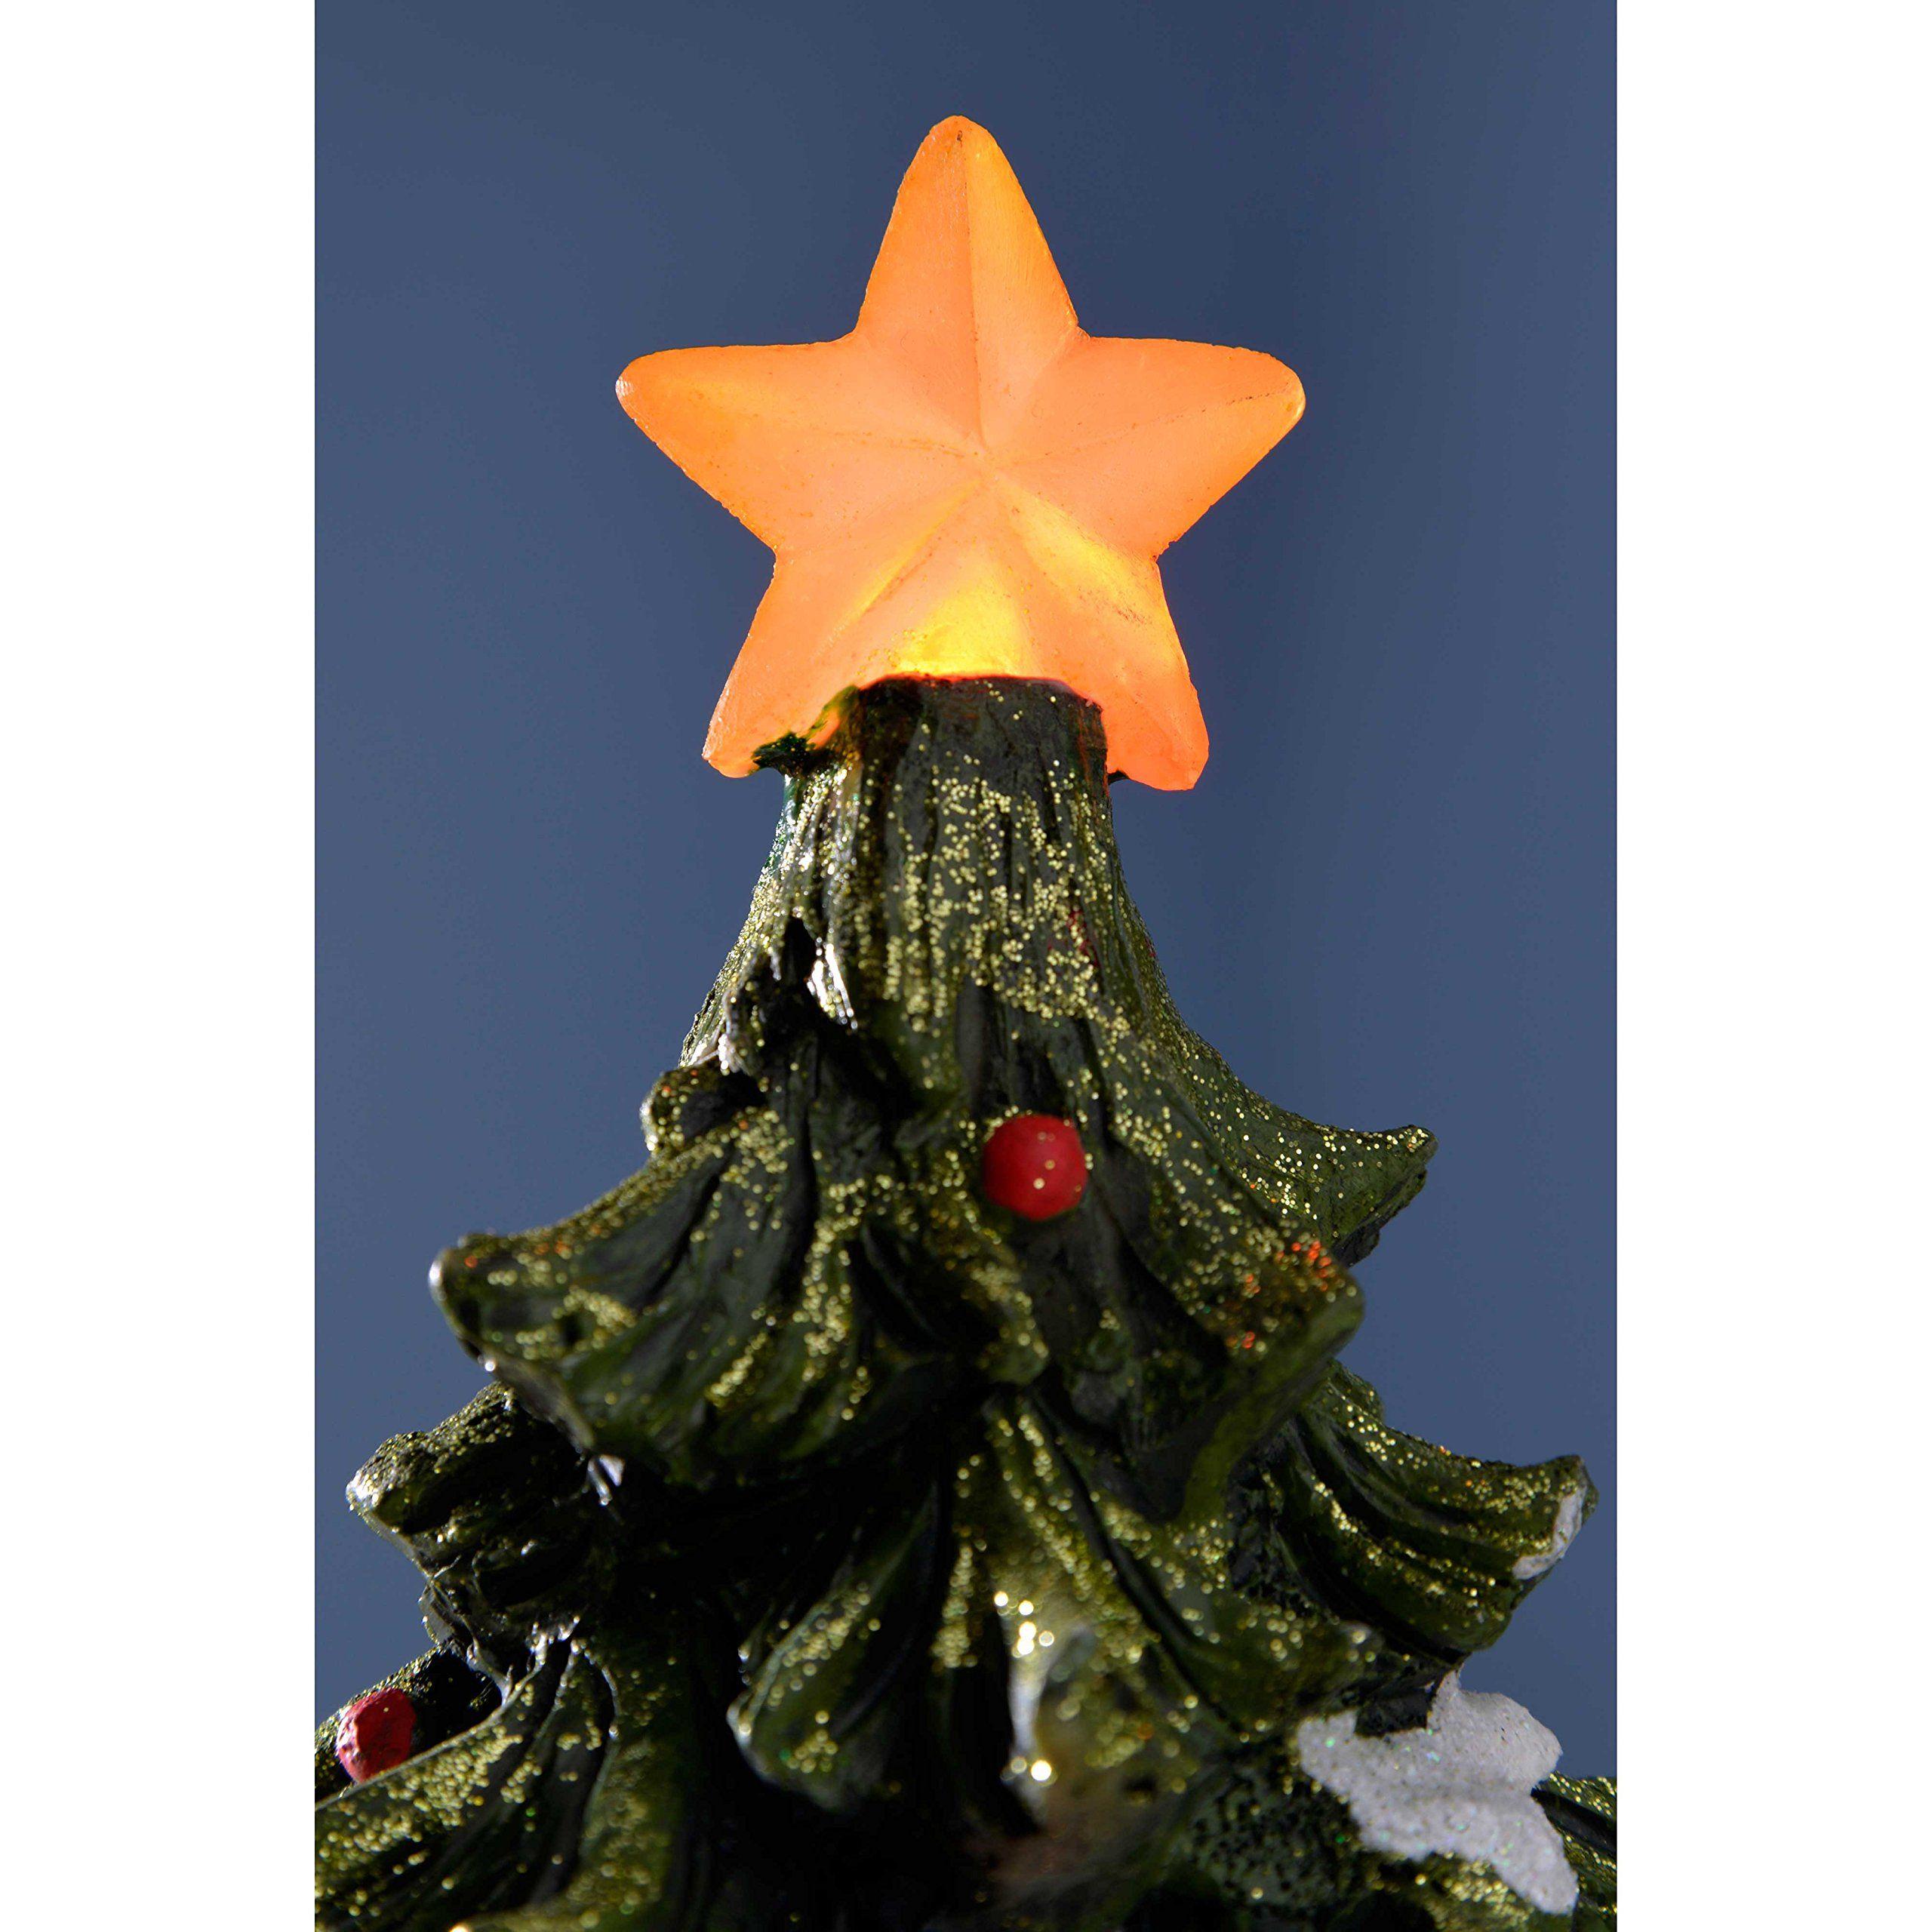 Werchristmas Prelit Led Christmas Tree Scene With Rotating Train Decoration 32 Cm Multicolour Read More At T Led Christmas Tree Train Decor Christmas Tree